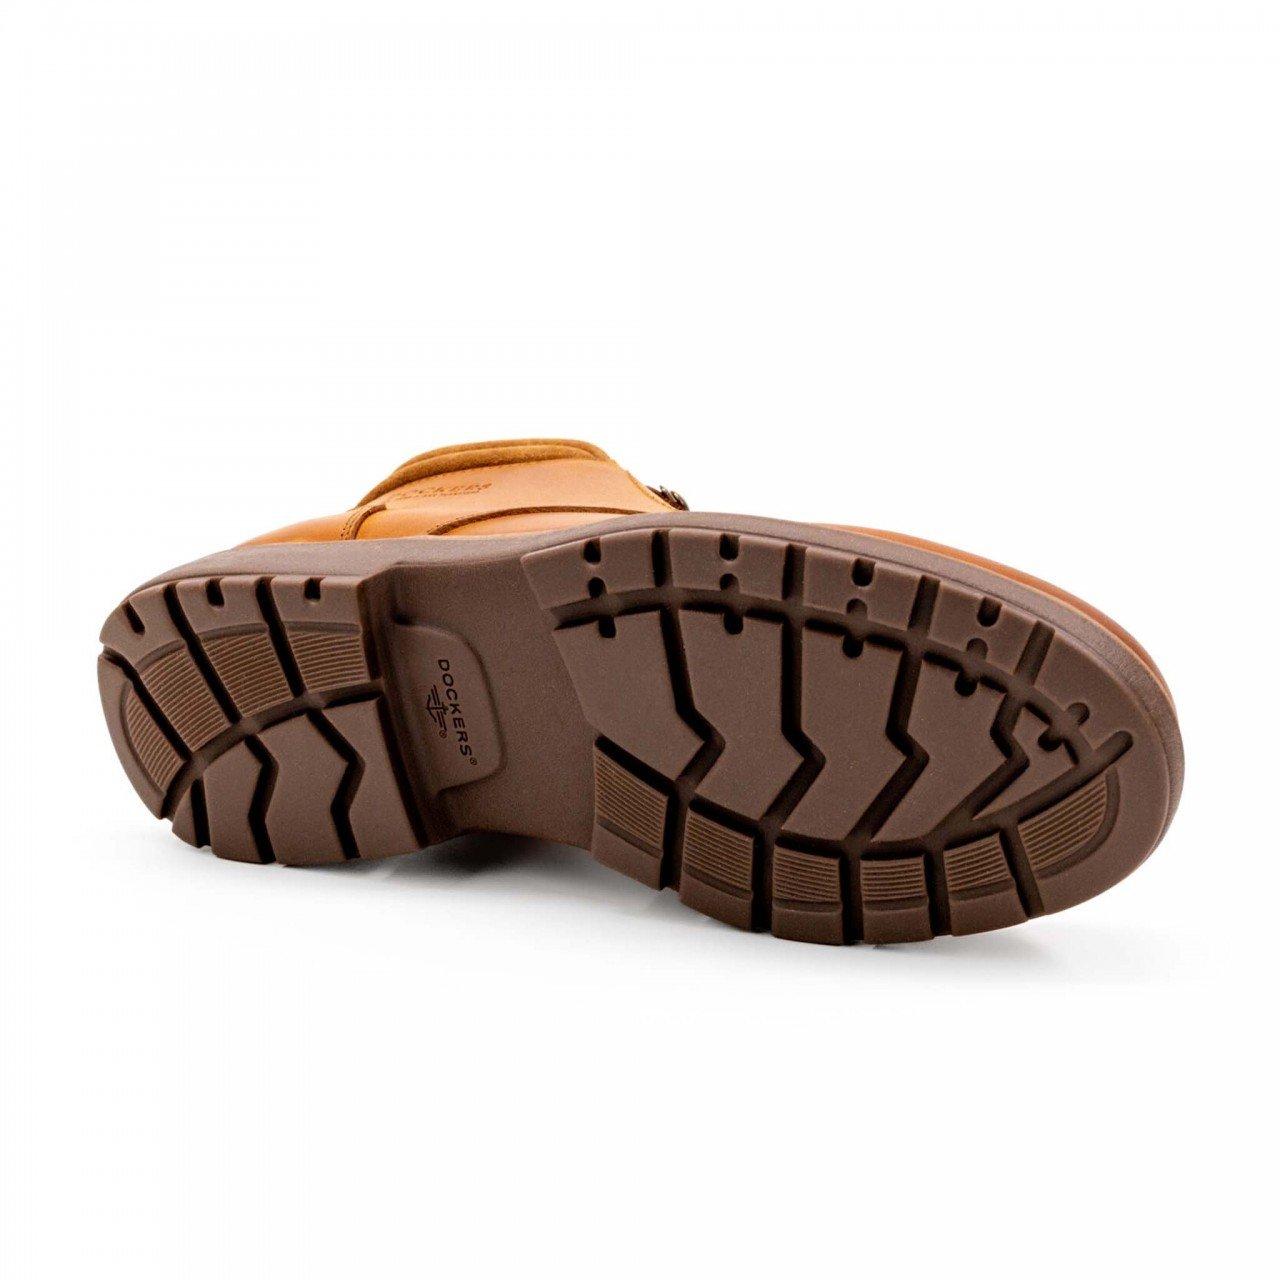 Bota marrón tan para hombre en piel Dockers 211711